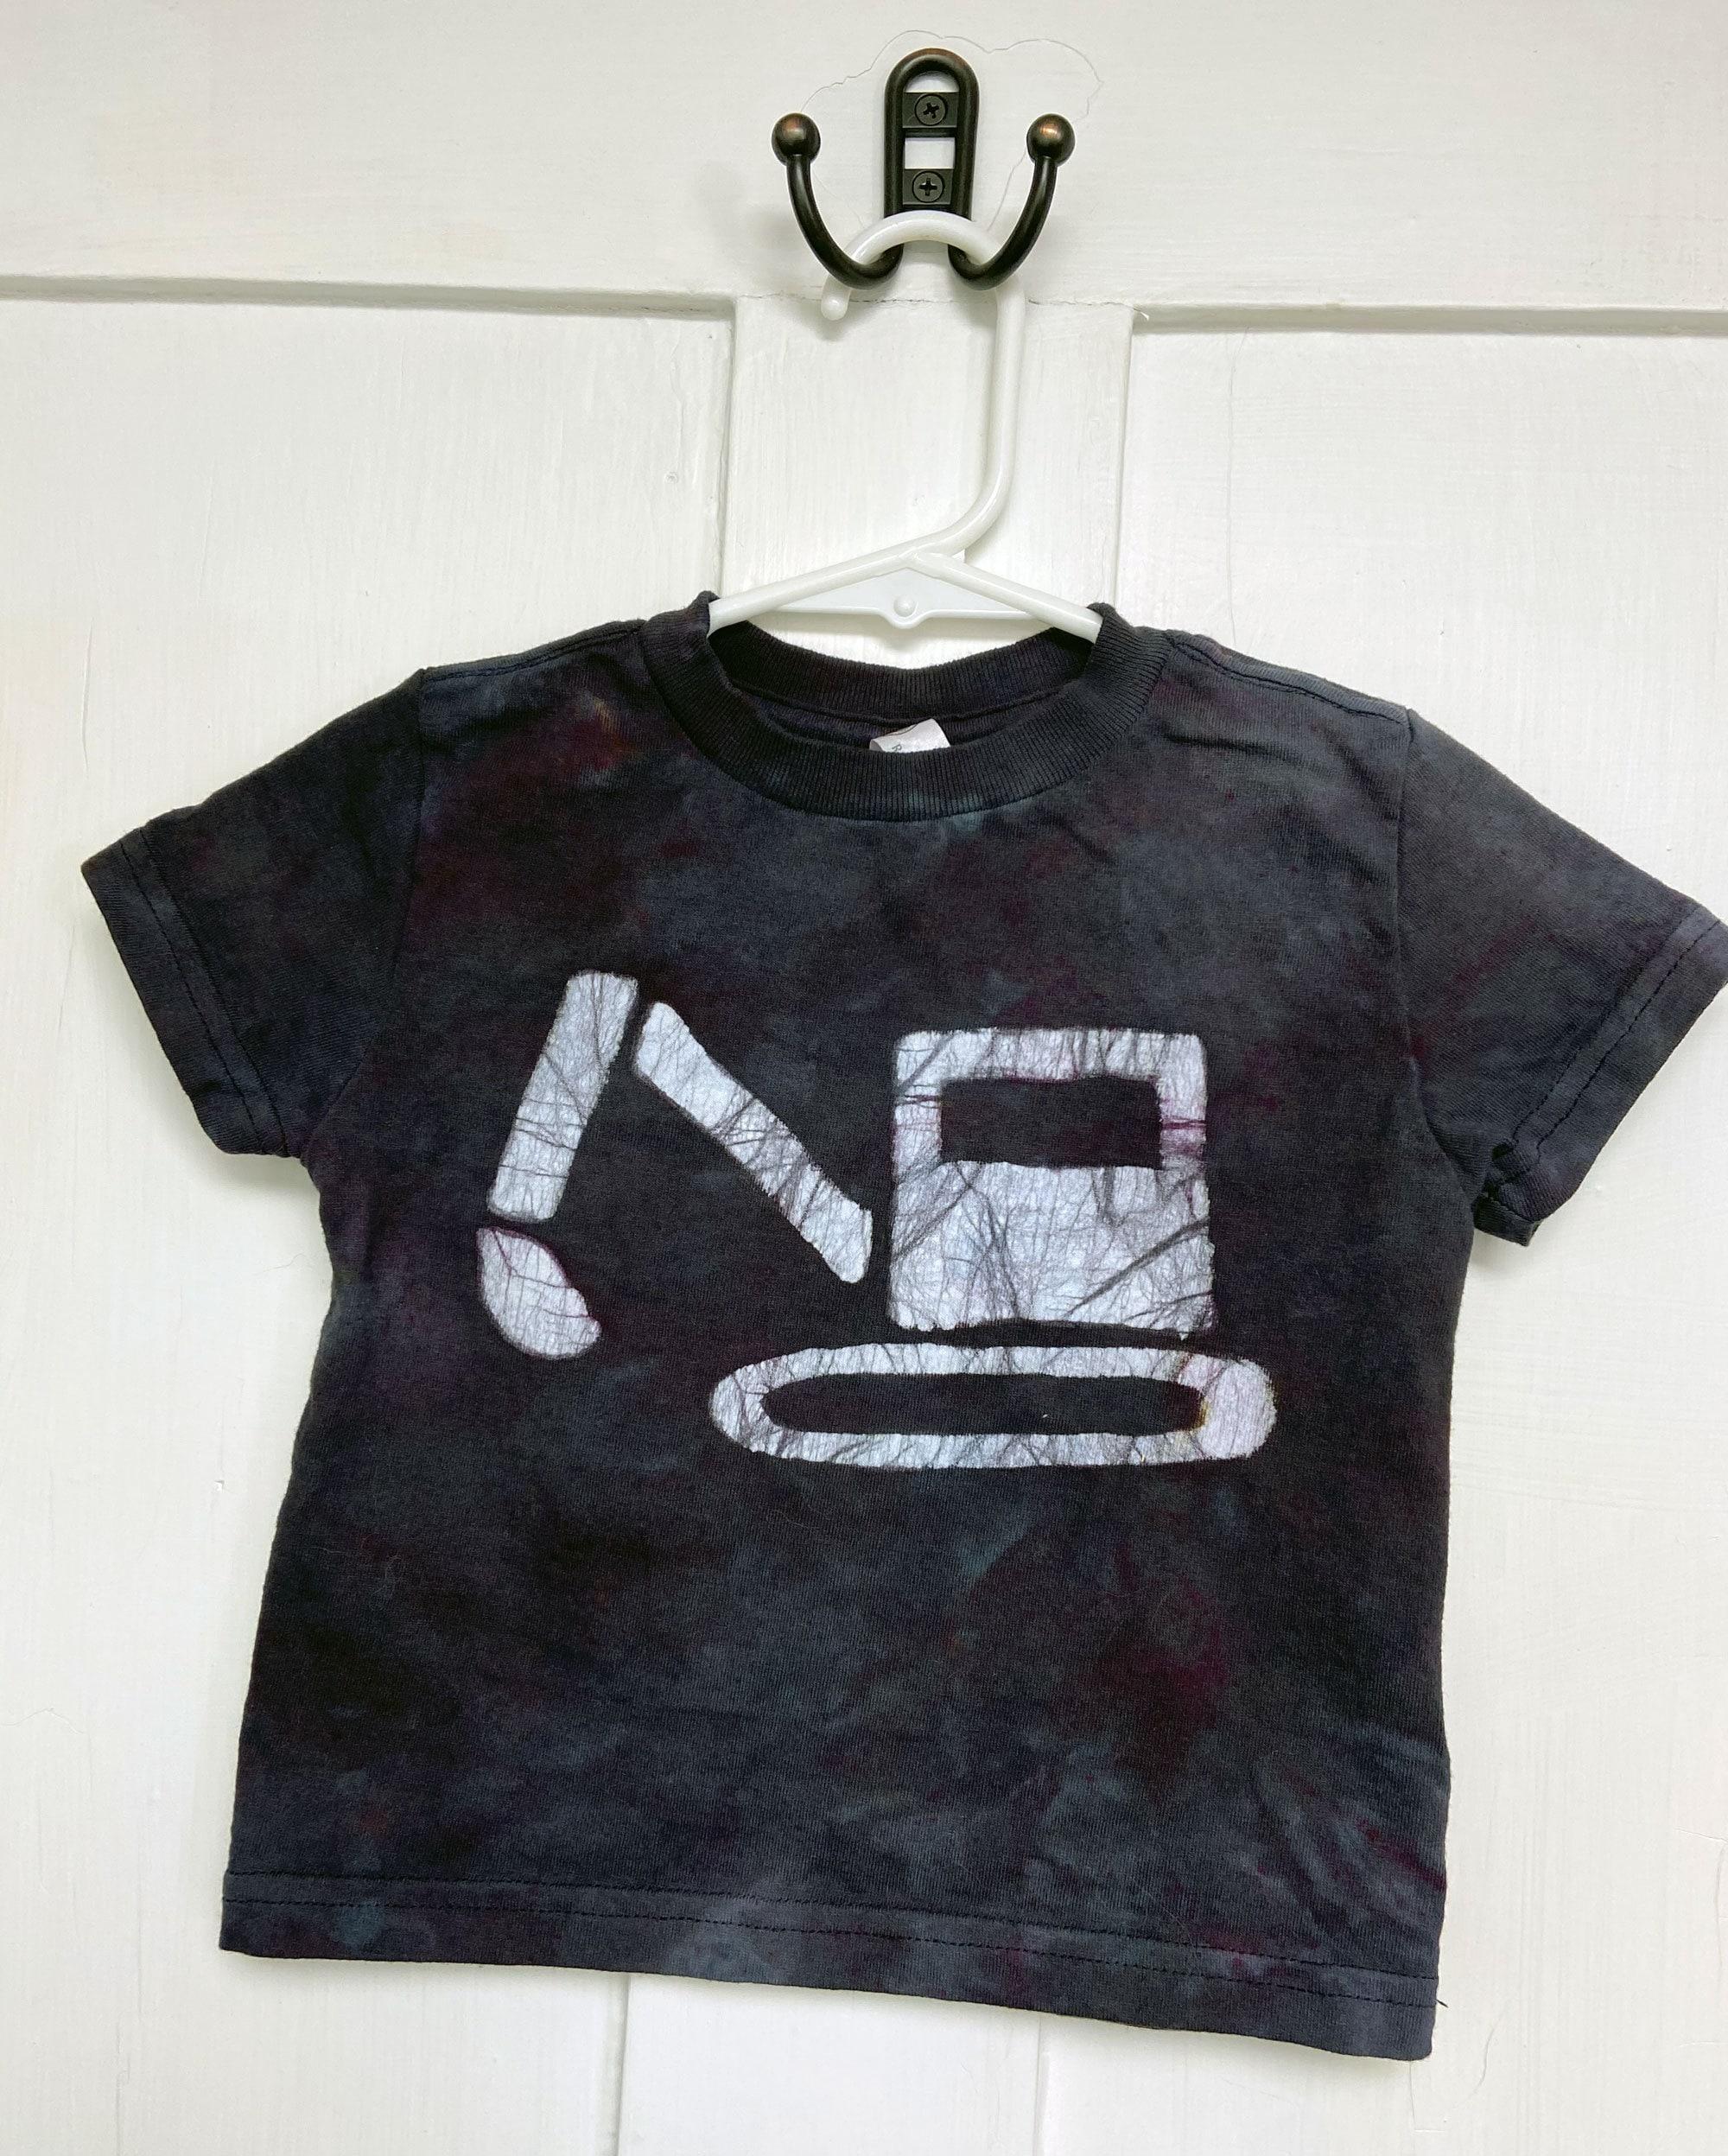 18 month black excavator shirt by Peace, Baby! Batiks